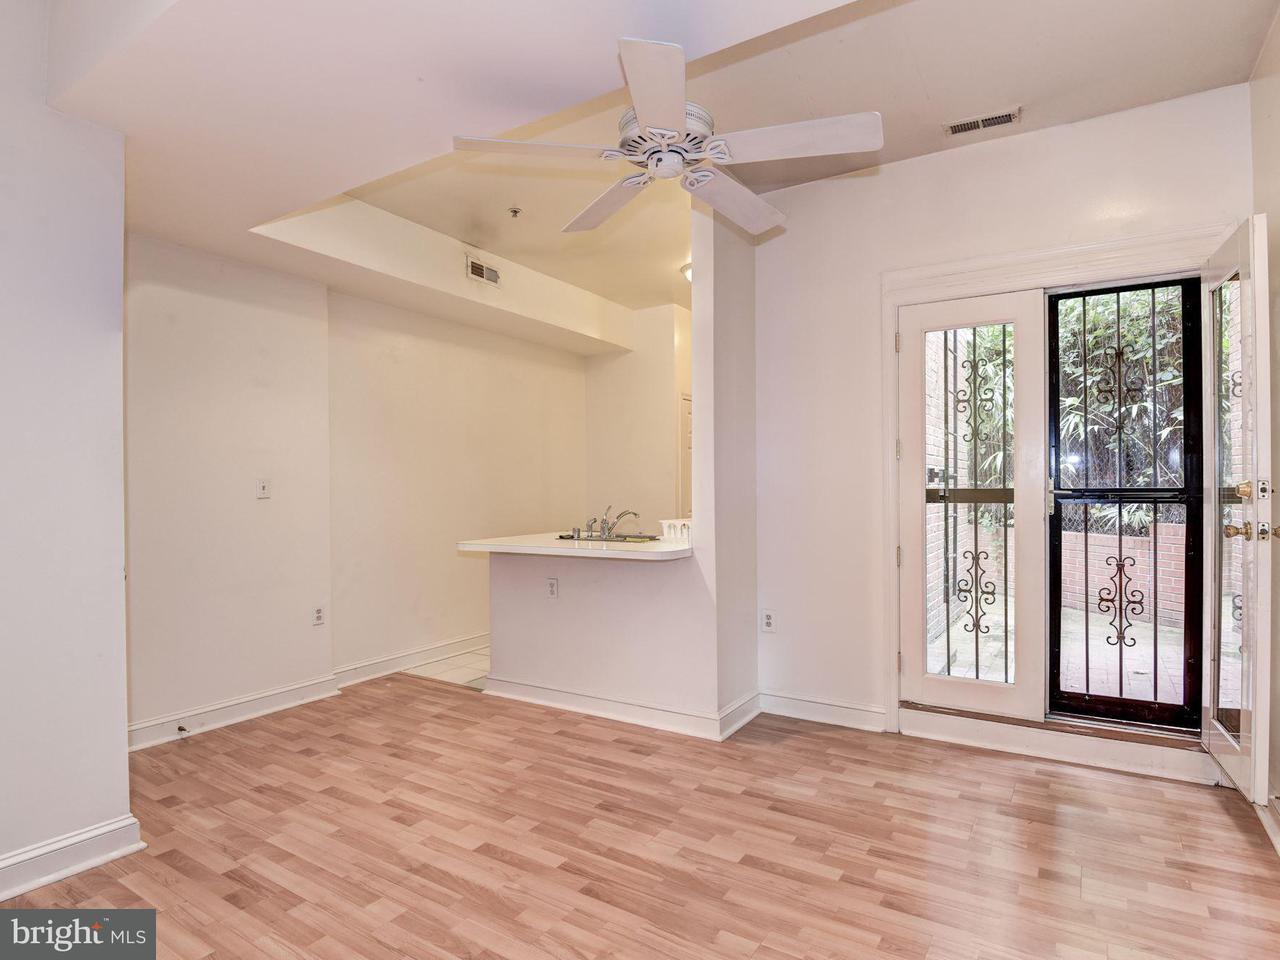 多戶家庭房屋 為 出售 在 2303 17TH ST NW 2303 17TH ST NW Washington, 哥倫比亞特區 20009 美國